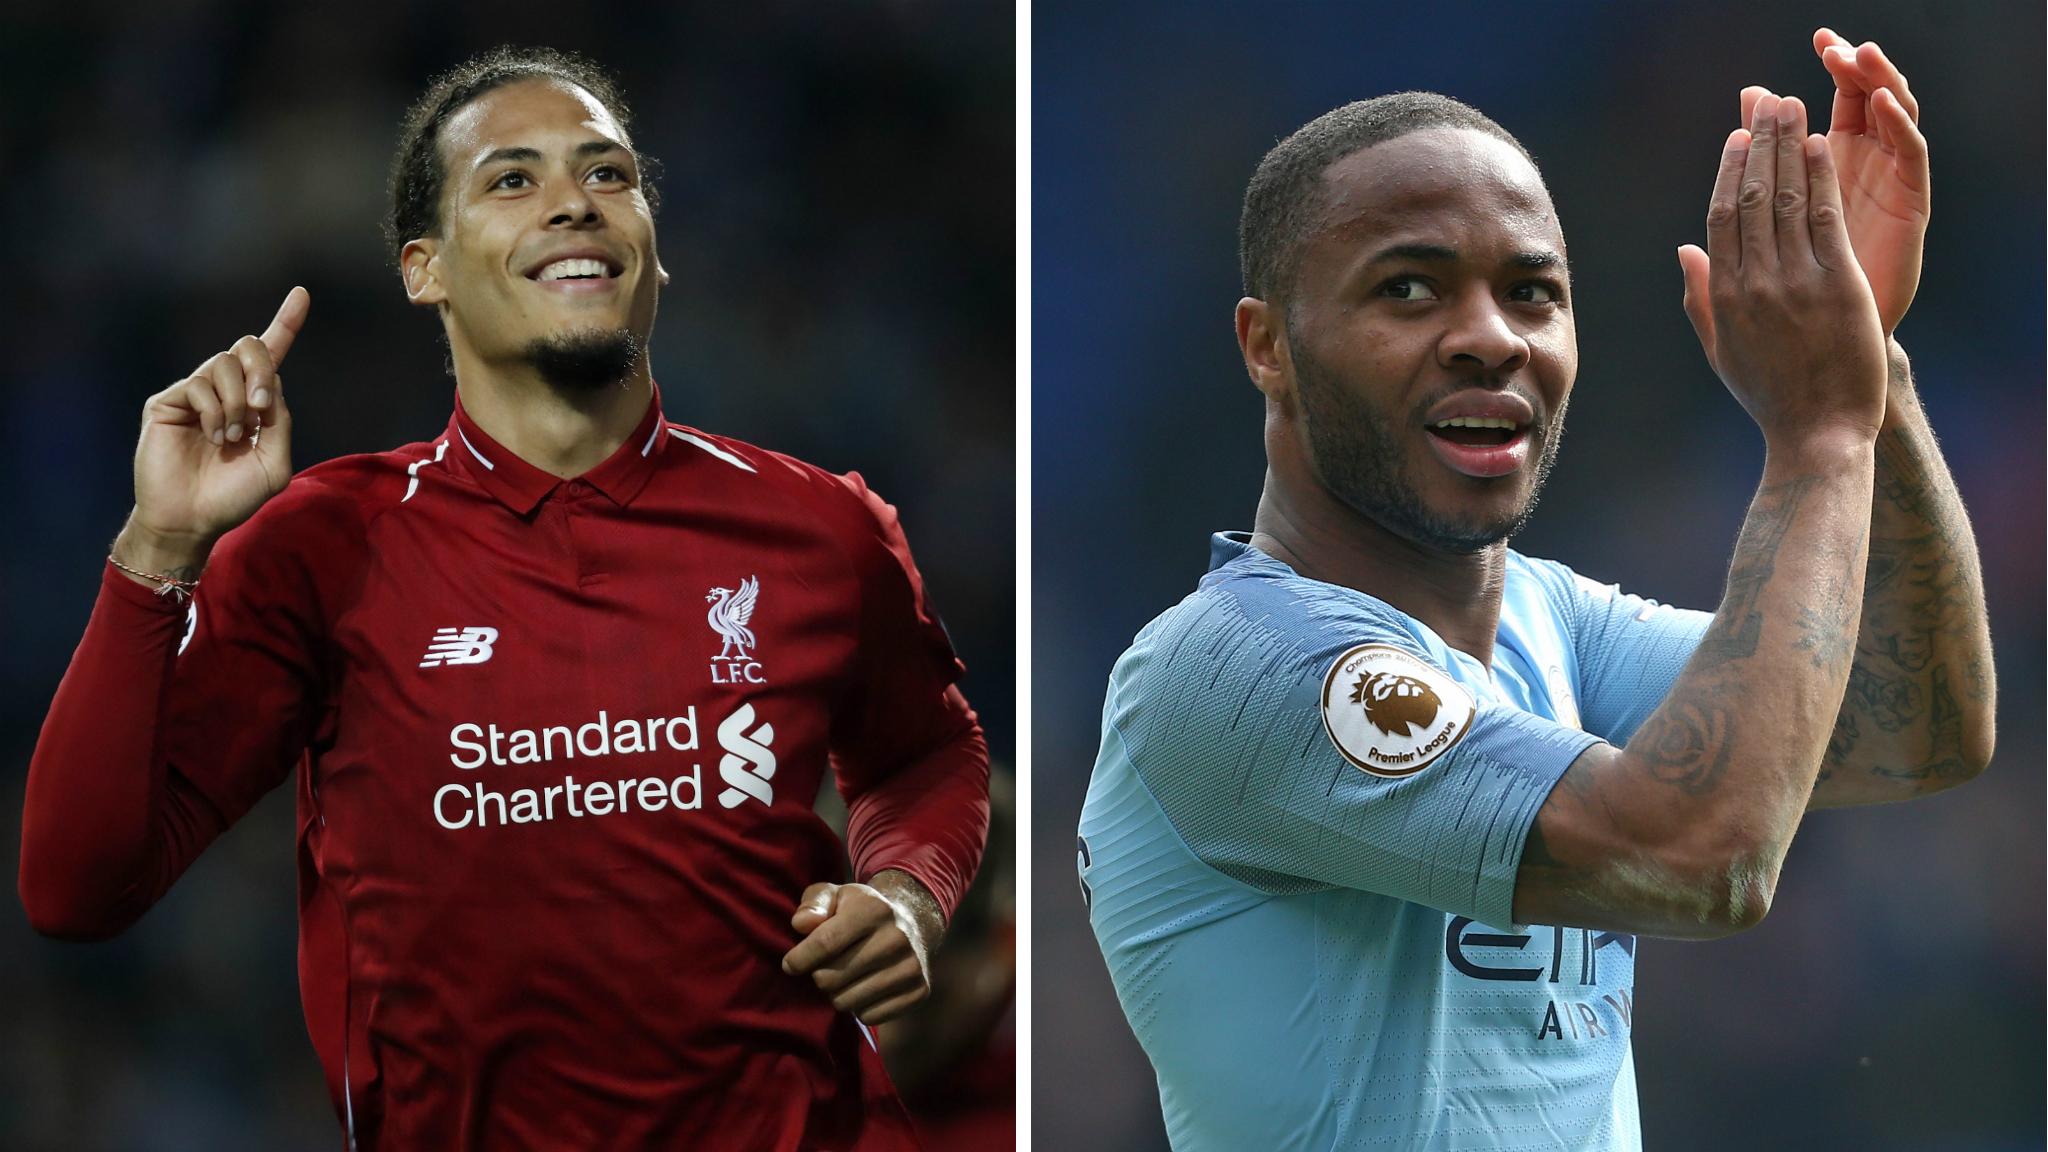 PFA Player of the Year - Virgil van Dijk or Raheem Sterling? BBC pundits' verdict